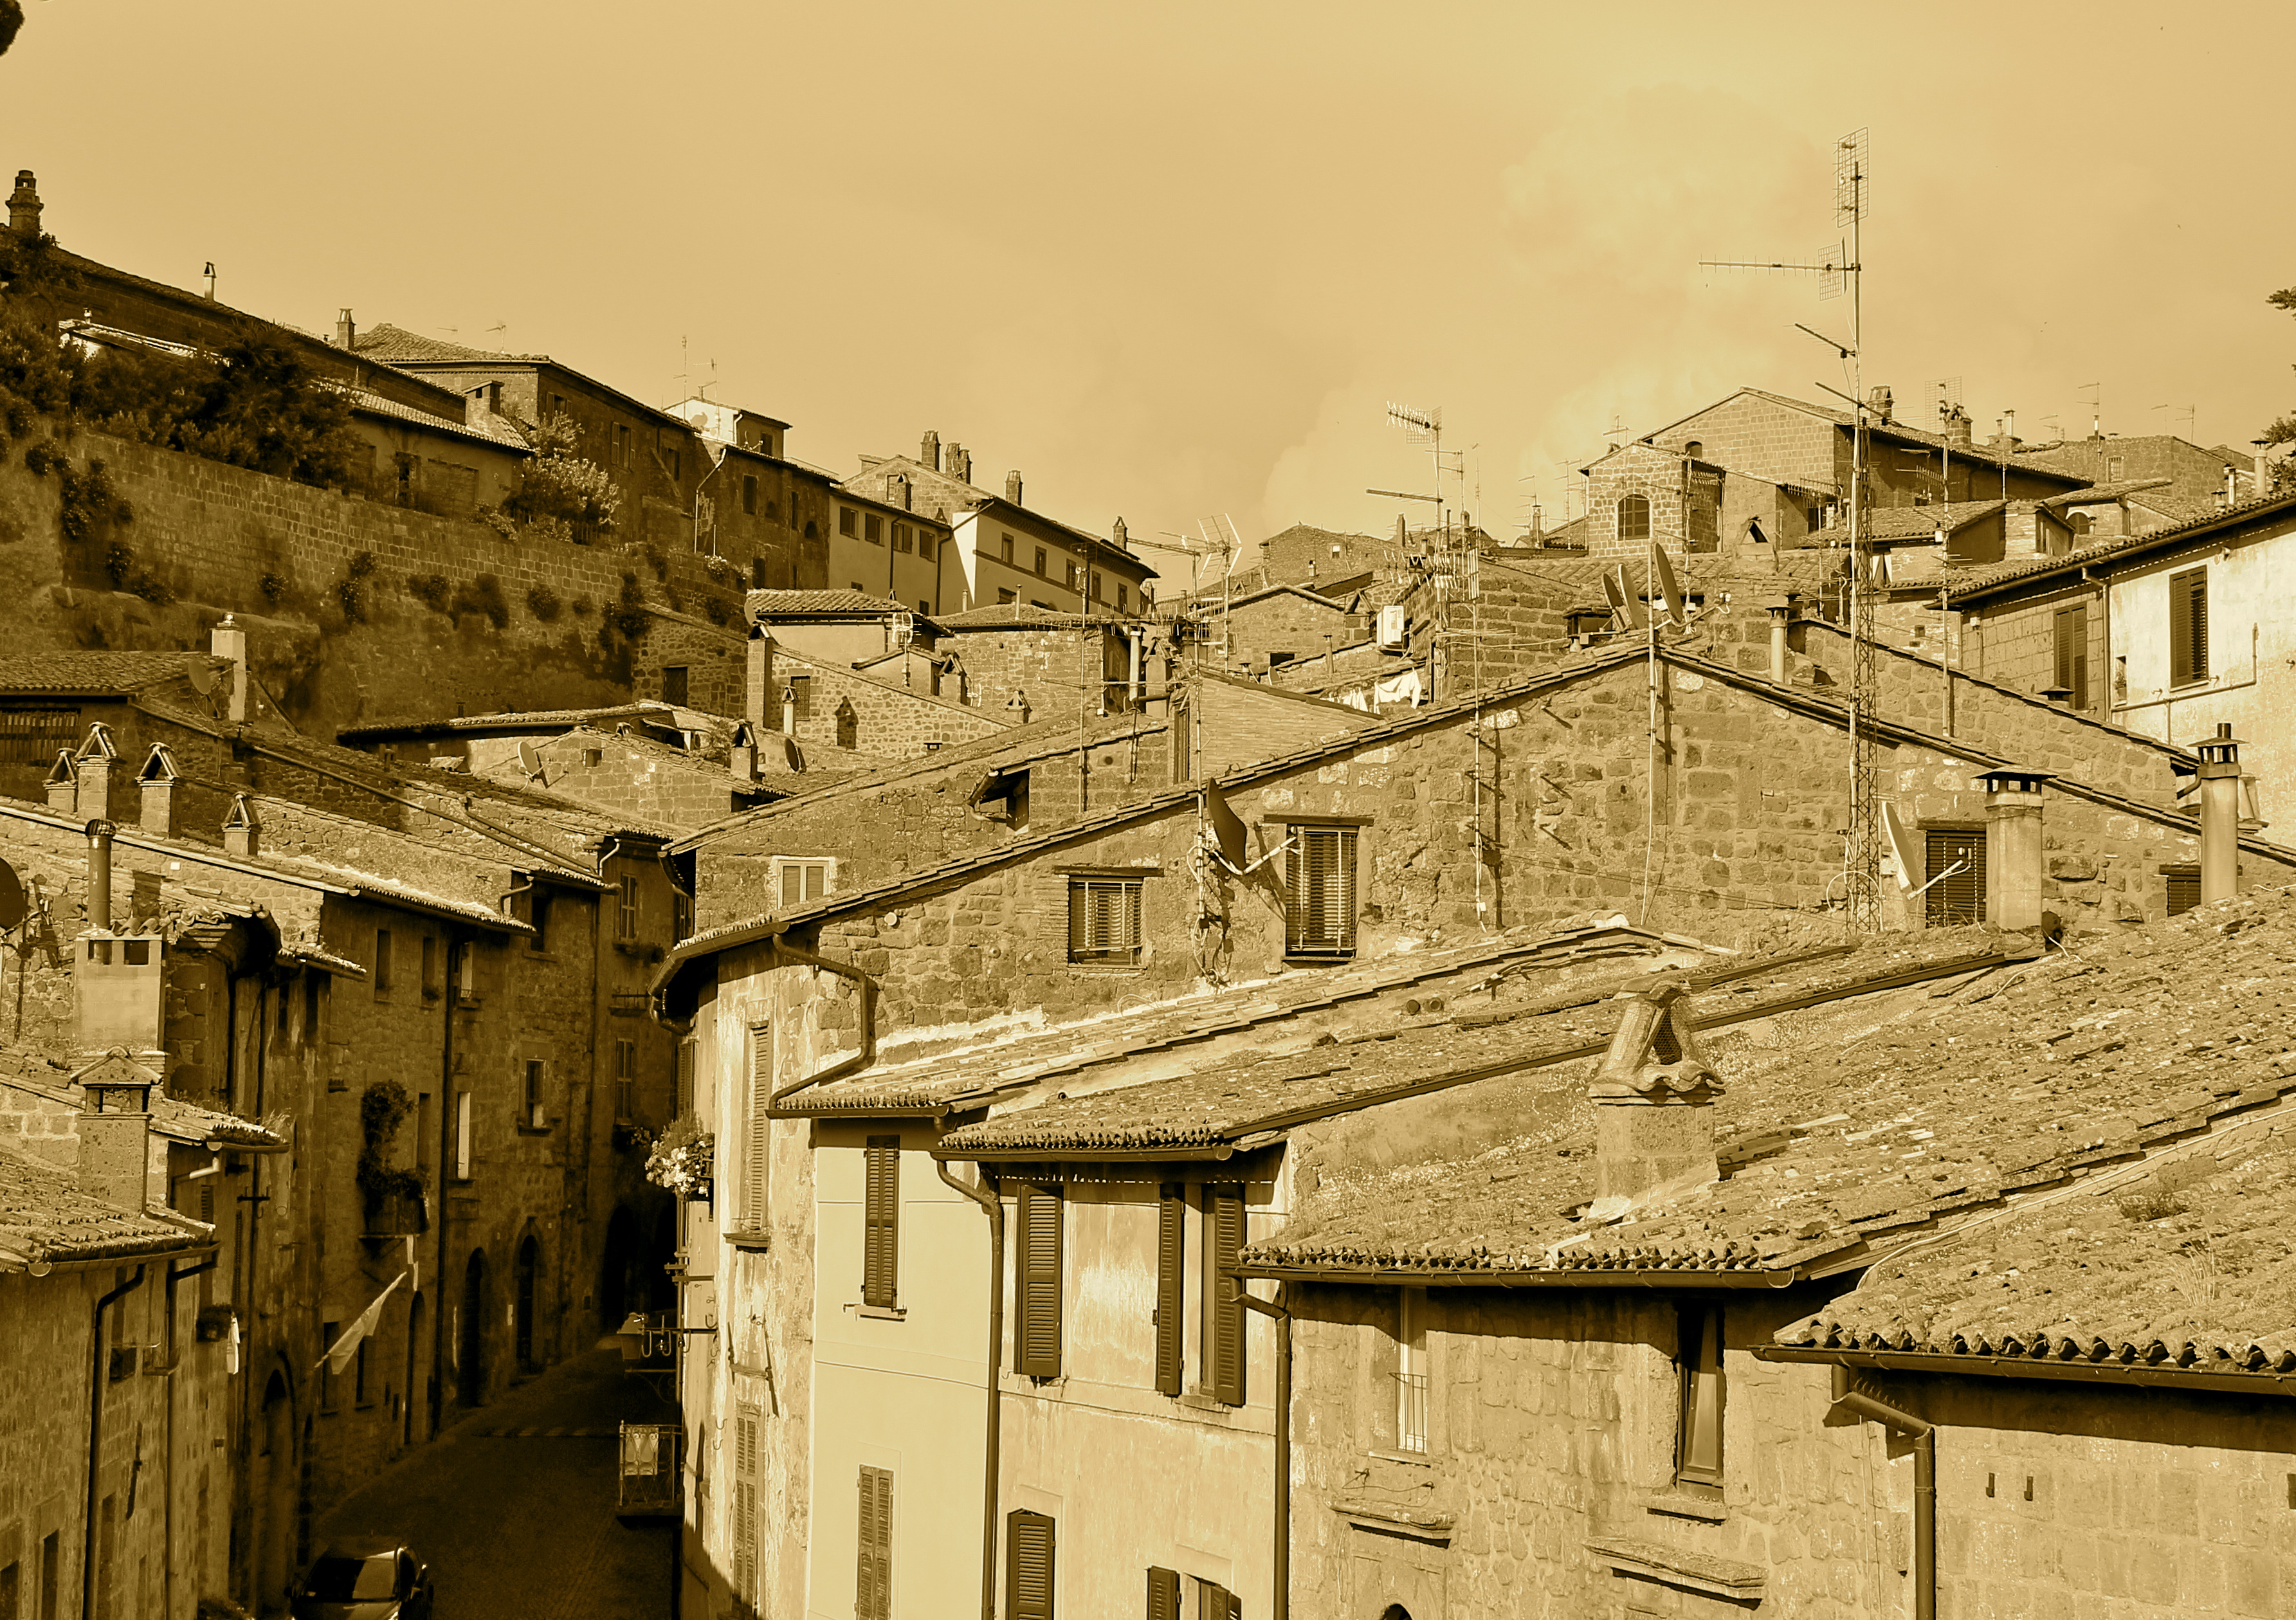 Orvieto, Italy in sepia